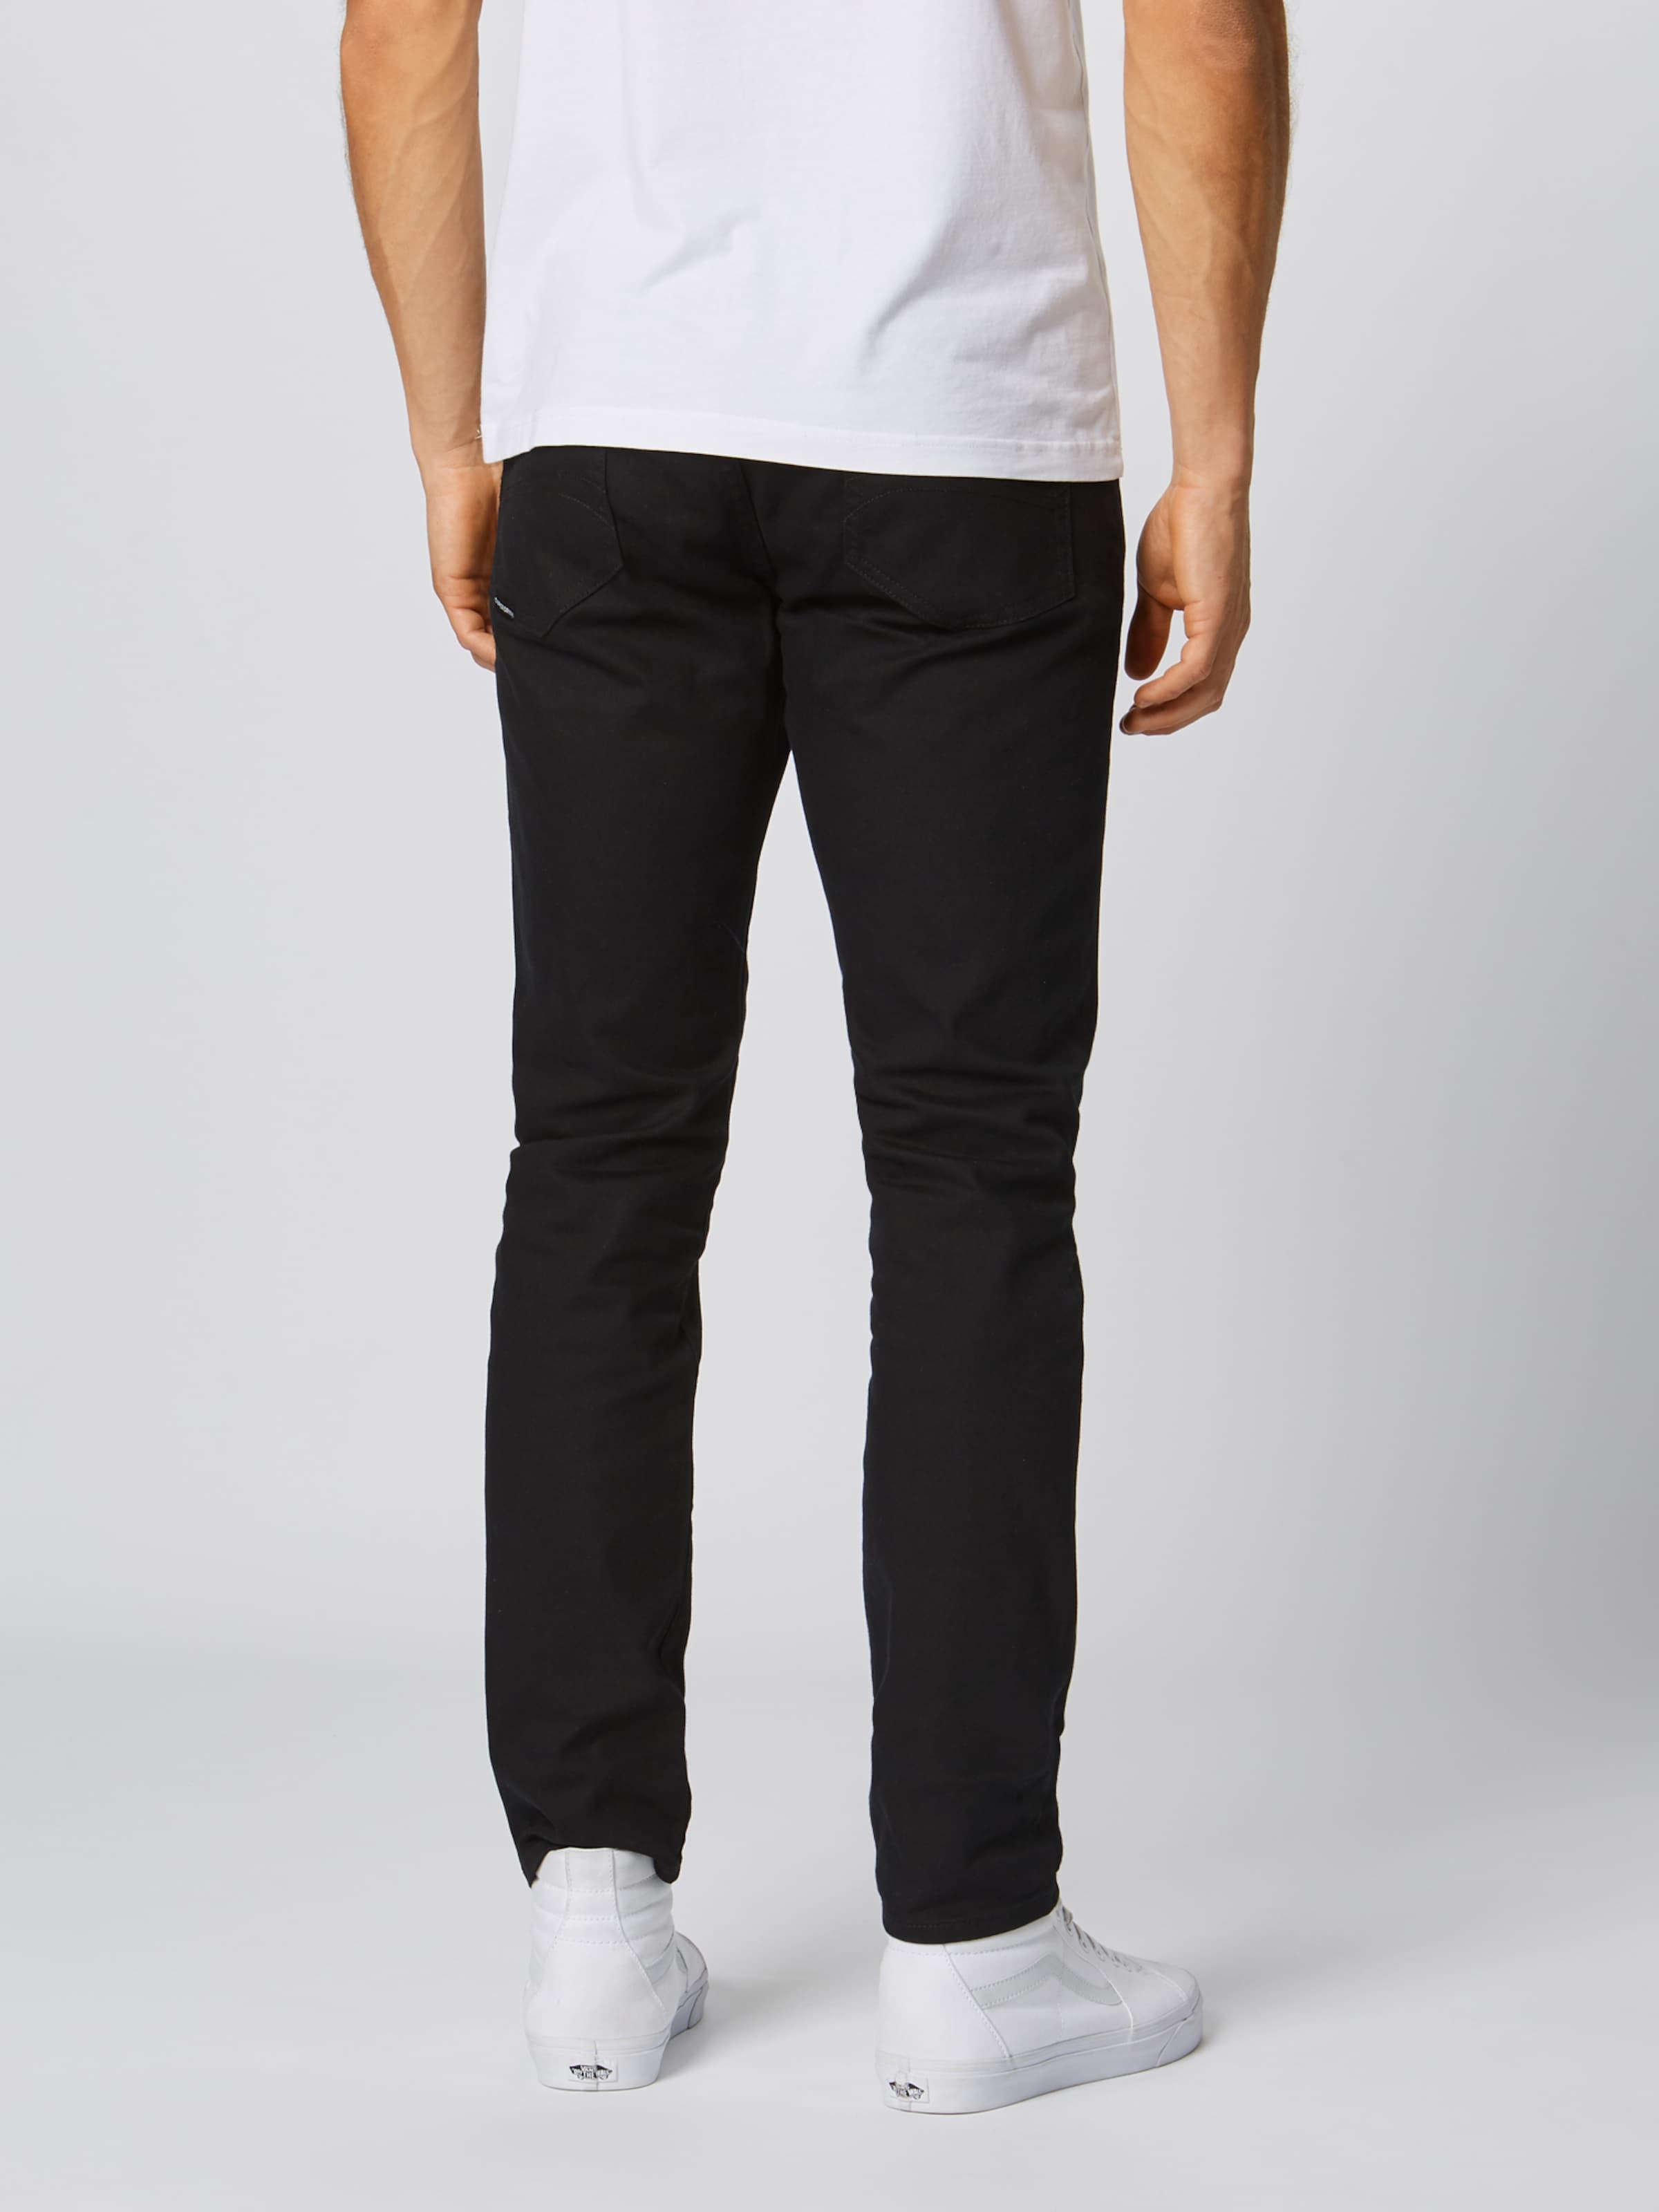 In Denim Superdry 'tyler' Jeans Black XZPkuOiT